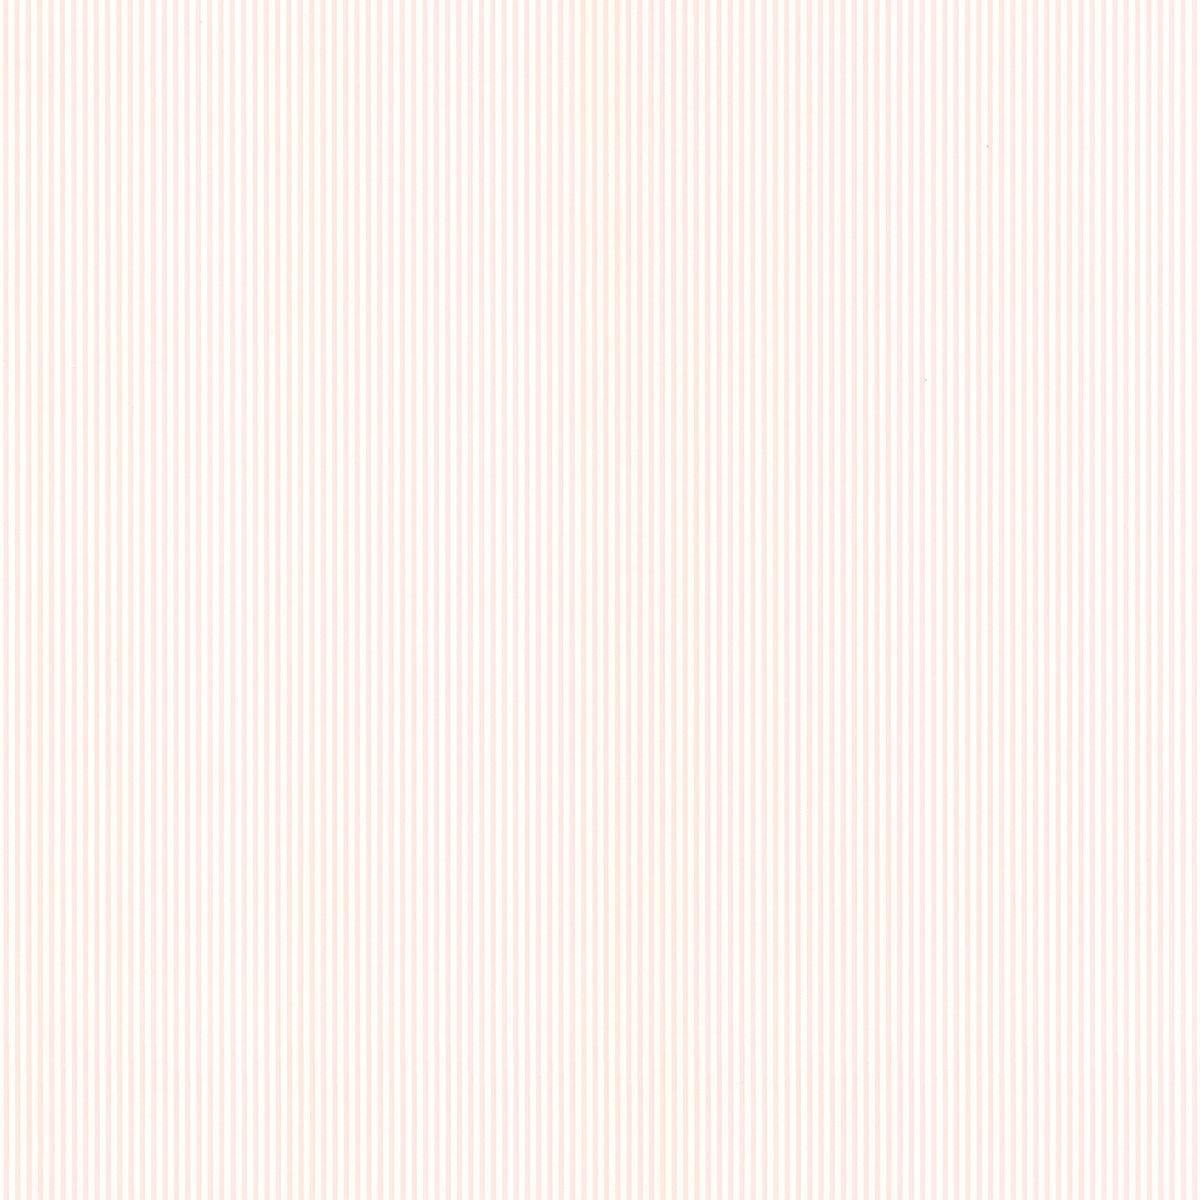 hochwertige tapeten und stoffe landhaus tapete floral prints pr33803 decowunder. Black Bedroom Furniture Sets. Home Design Ideas